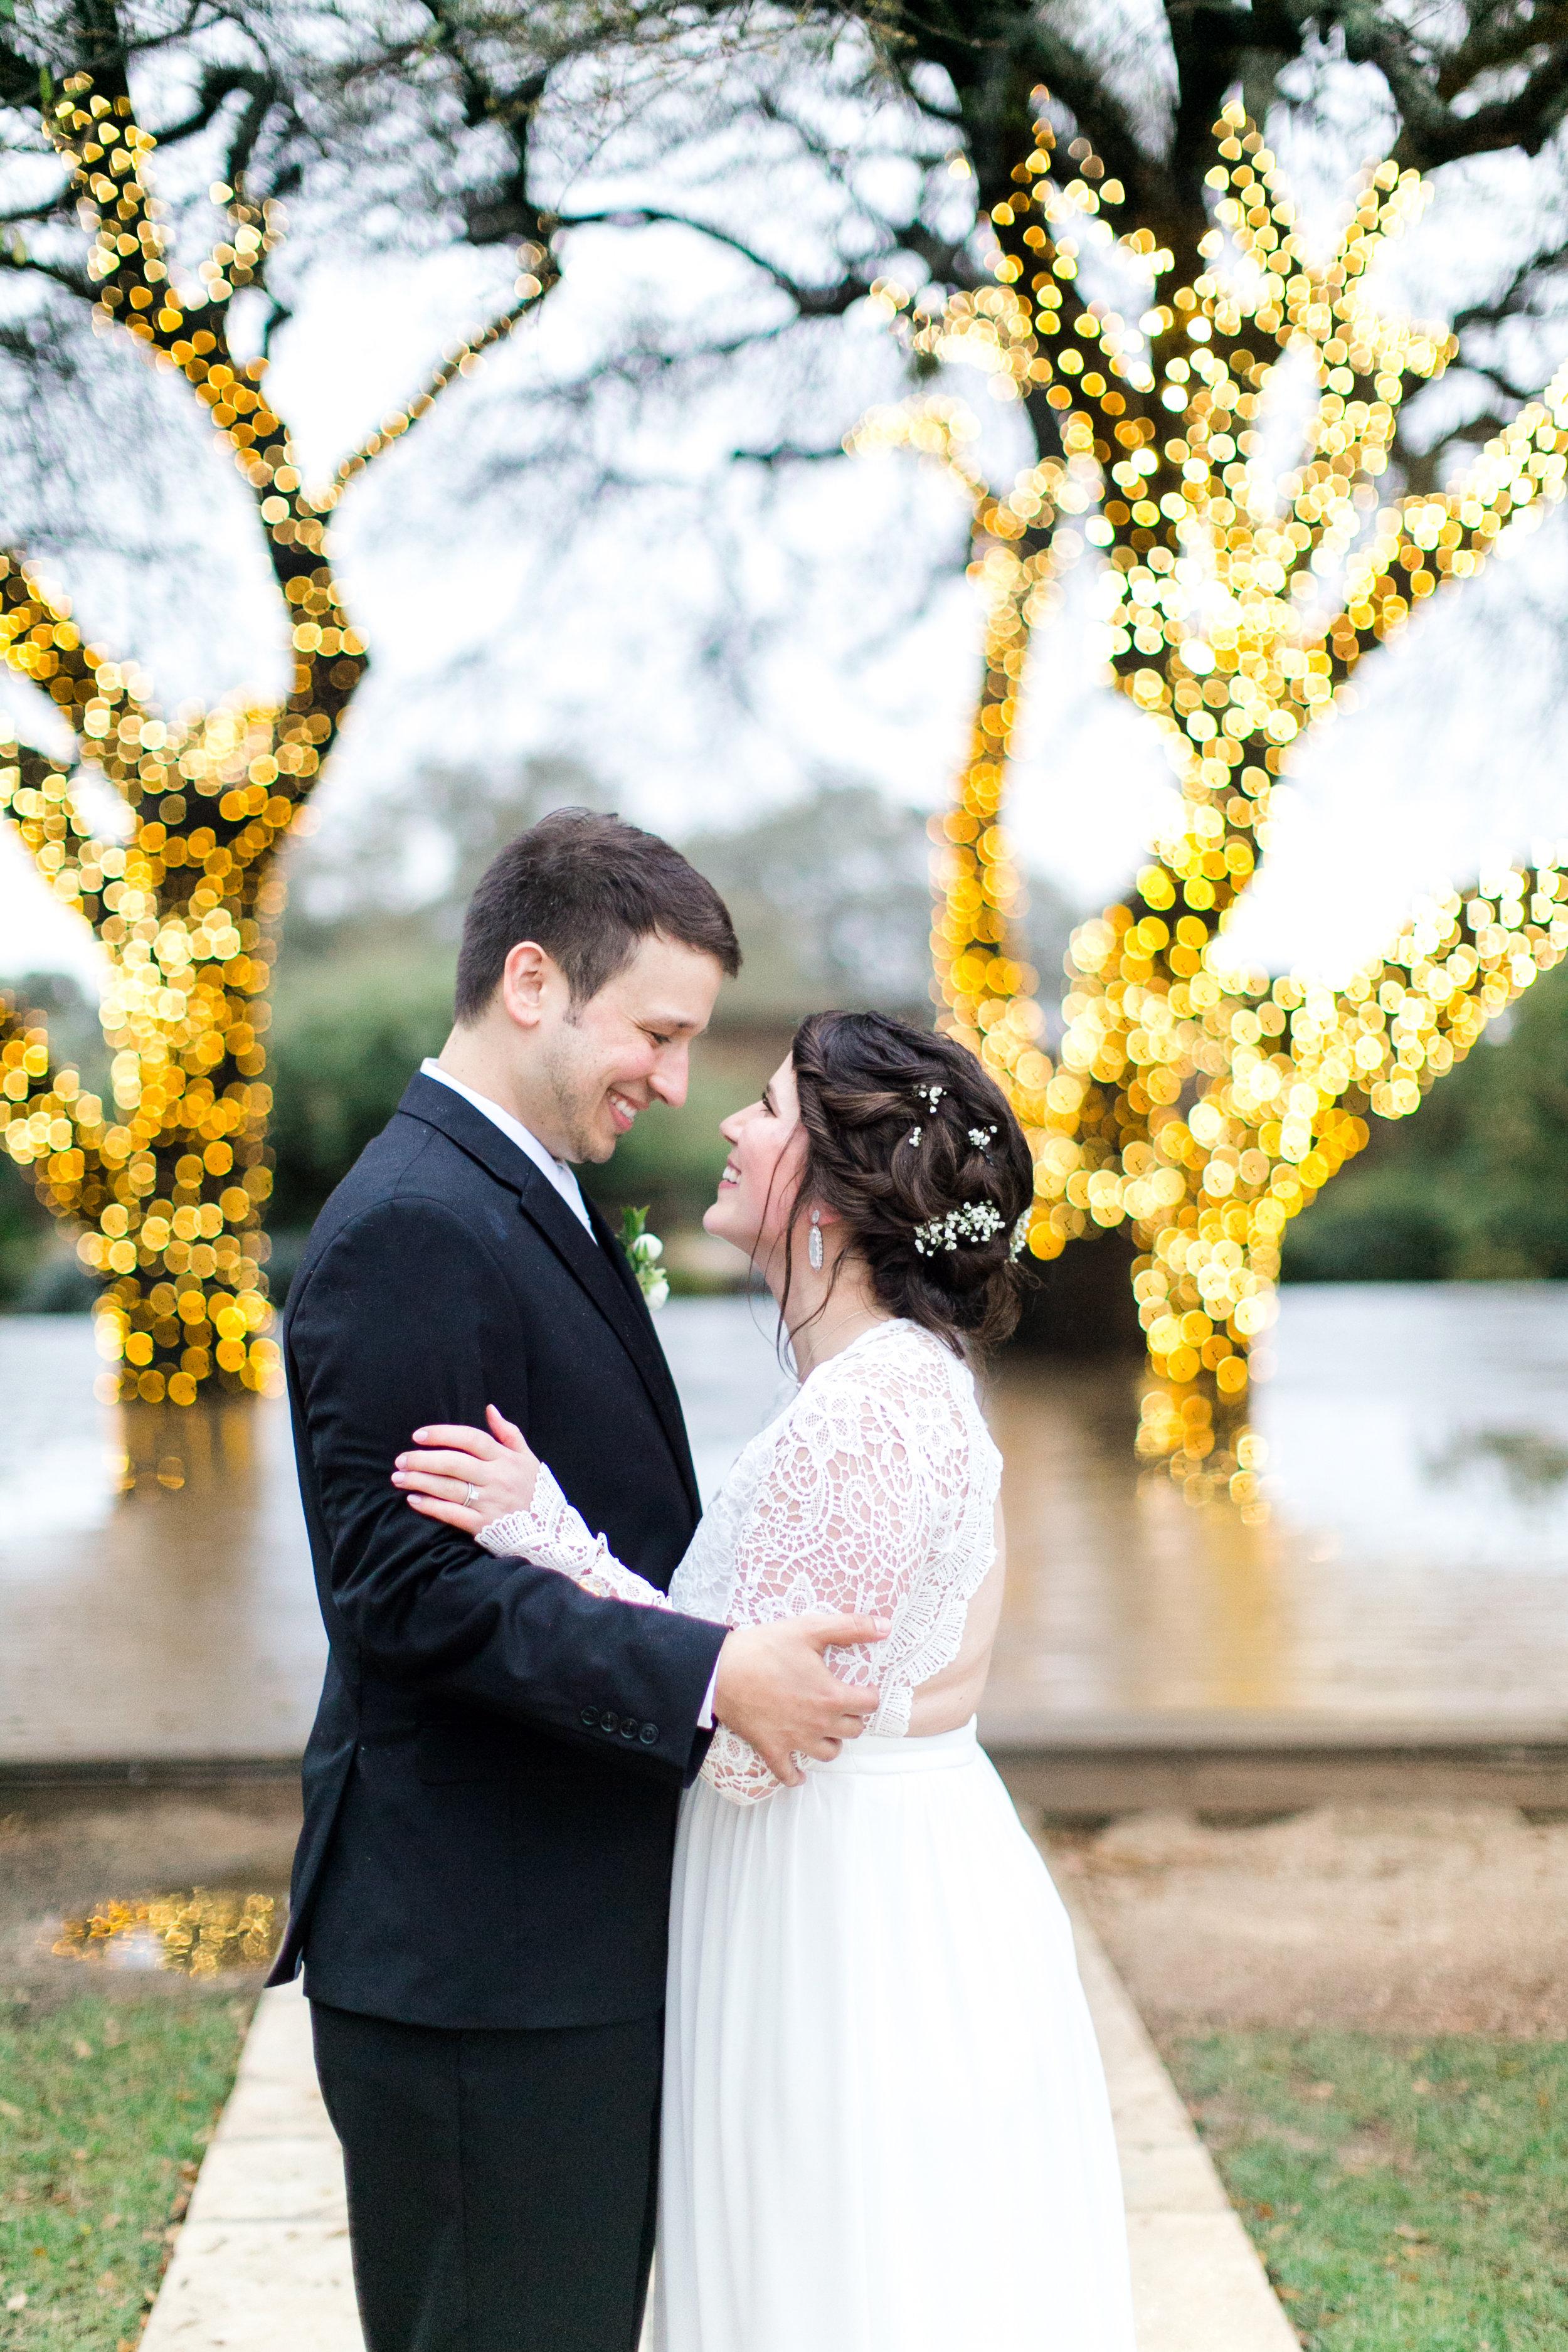 Austin_Texas_Fine_Art_Wedding_Photographer_Kayla_Snell_Photography_Antebellum_Oaks538.jpg